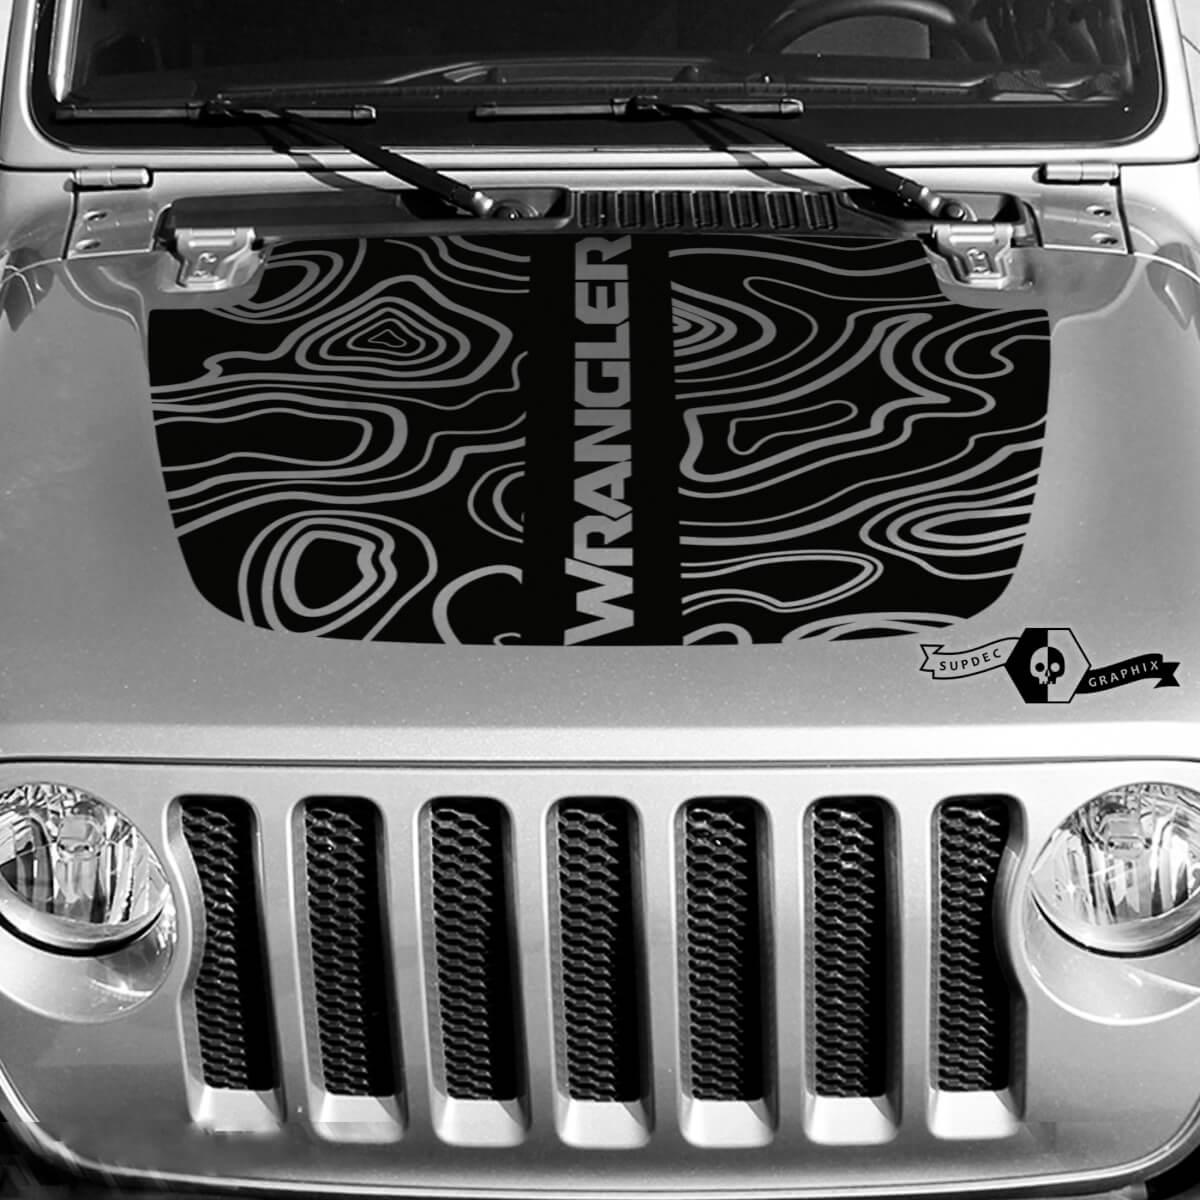 Neue Jeep Hood Vinyl Blackout Topographische Karte Aufkleber Aufkleber Text Wrangler